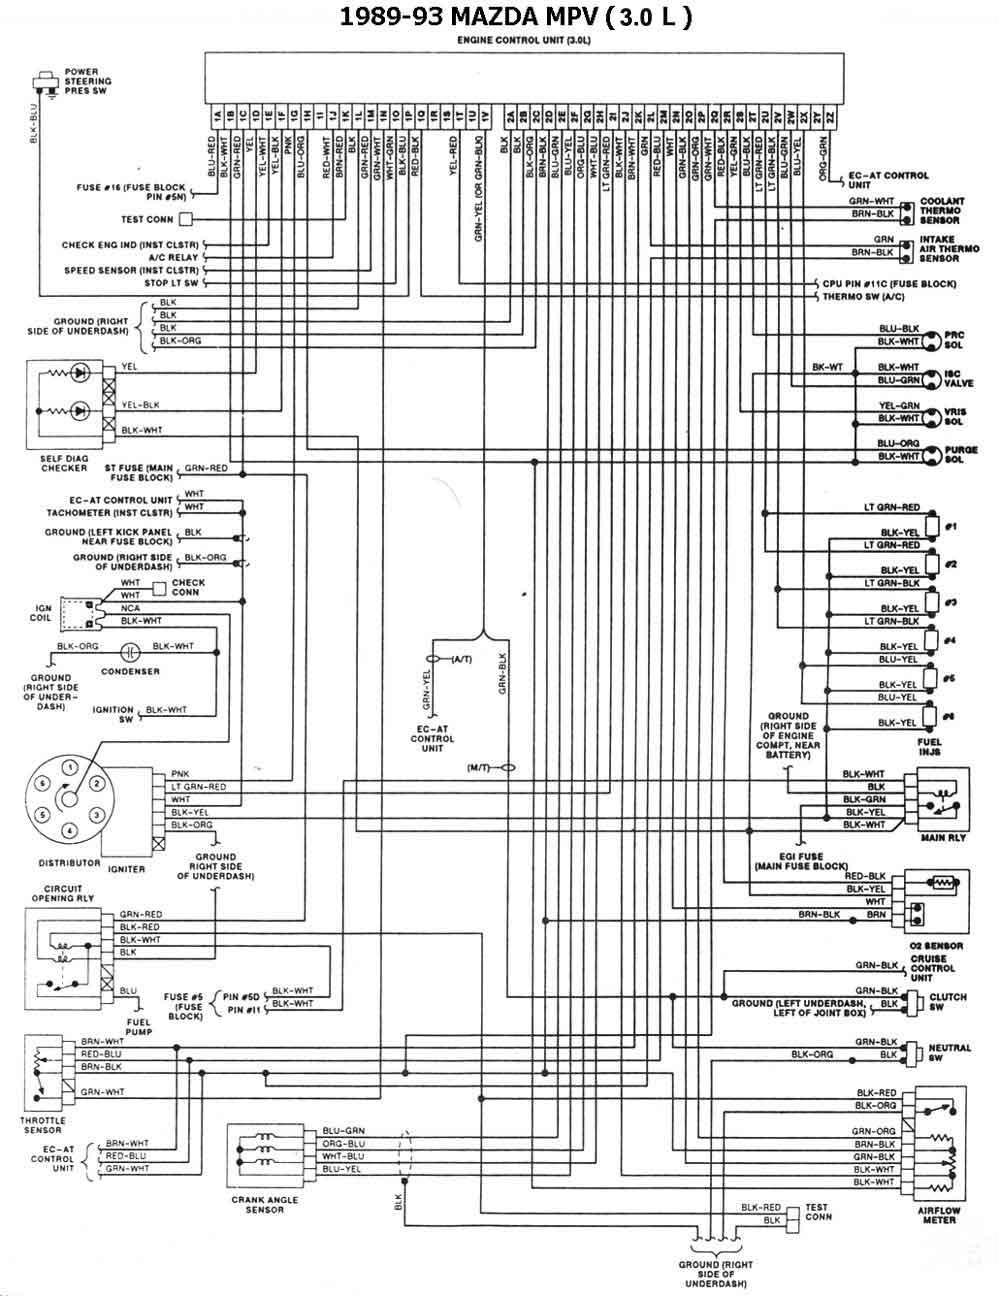 mazda xedos 6 fuse box mazda wiring diagrams